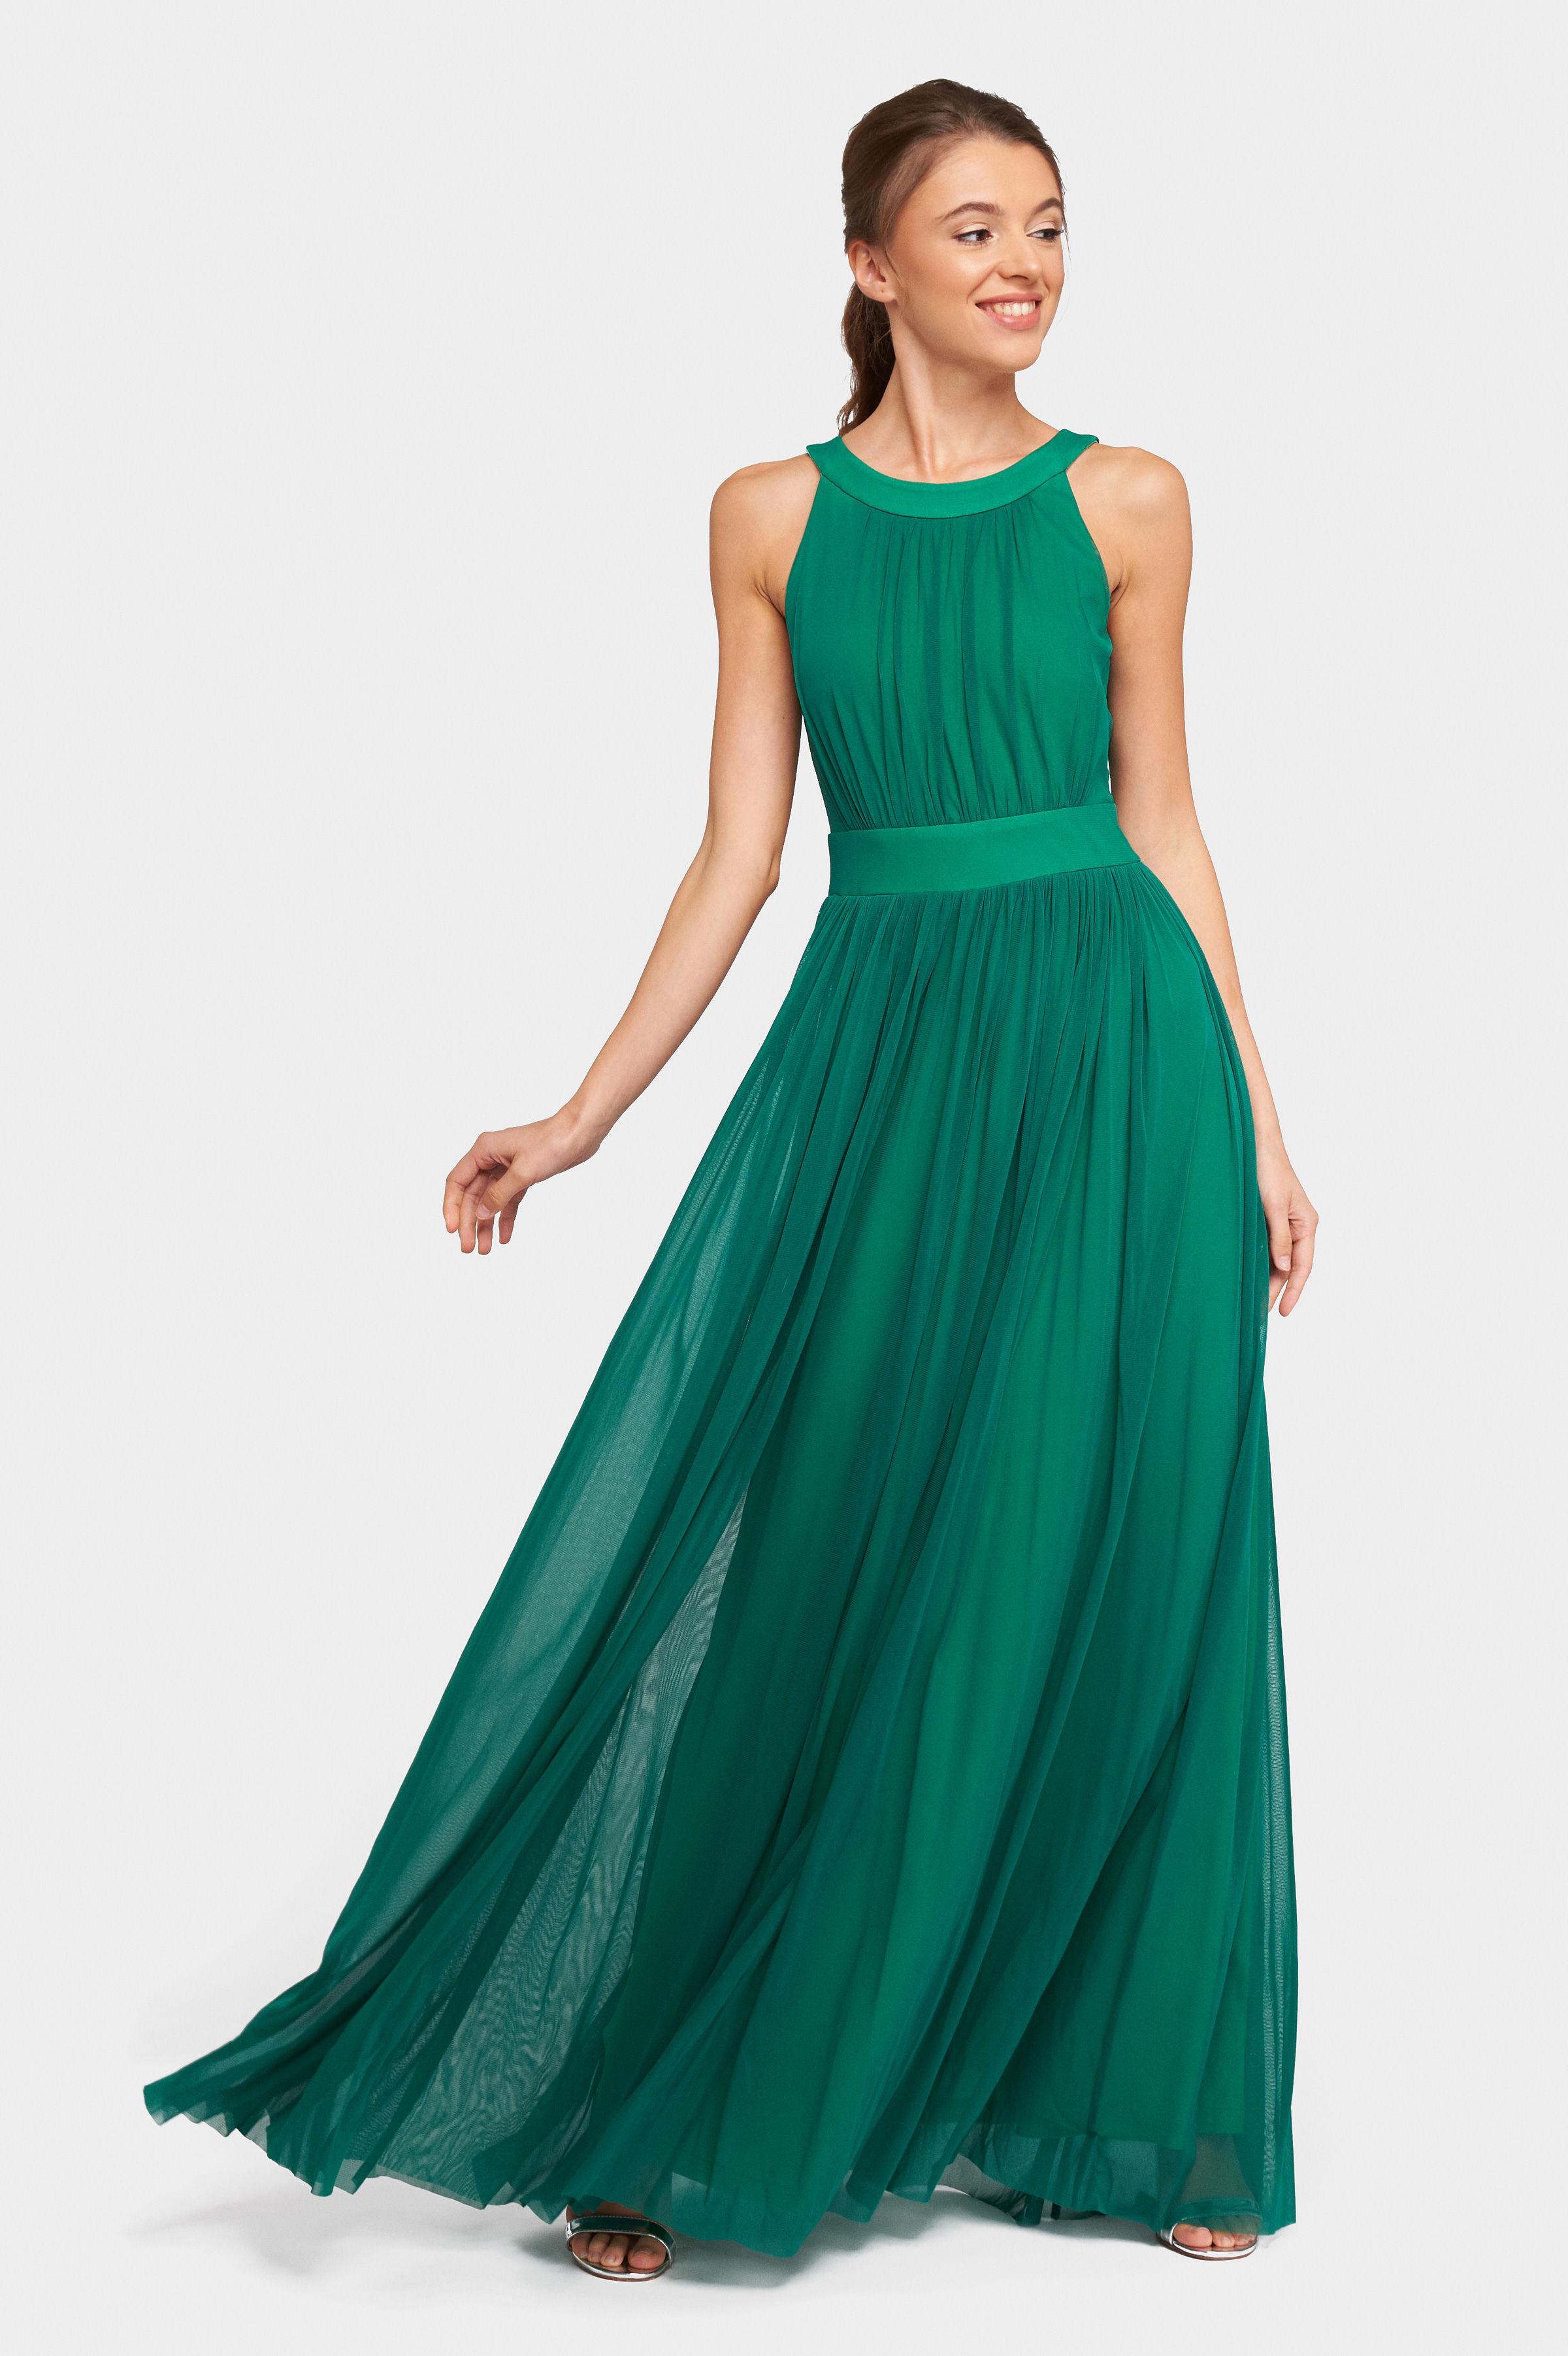 259878473a5b ... E-shop  Jeseň zima 2018 · Šaty · Spoločenské  Šaty Mariestela. Šaty  Mariestela